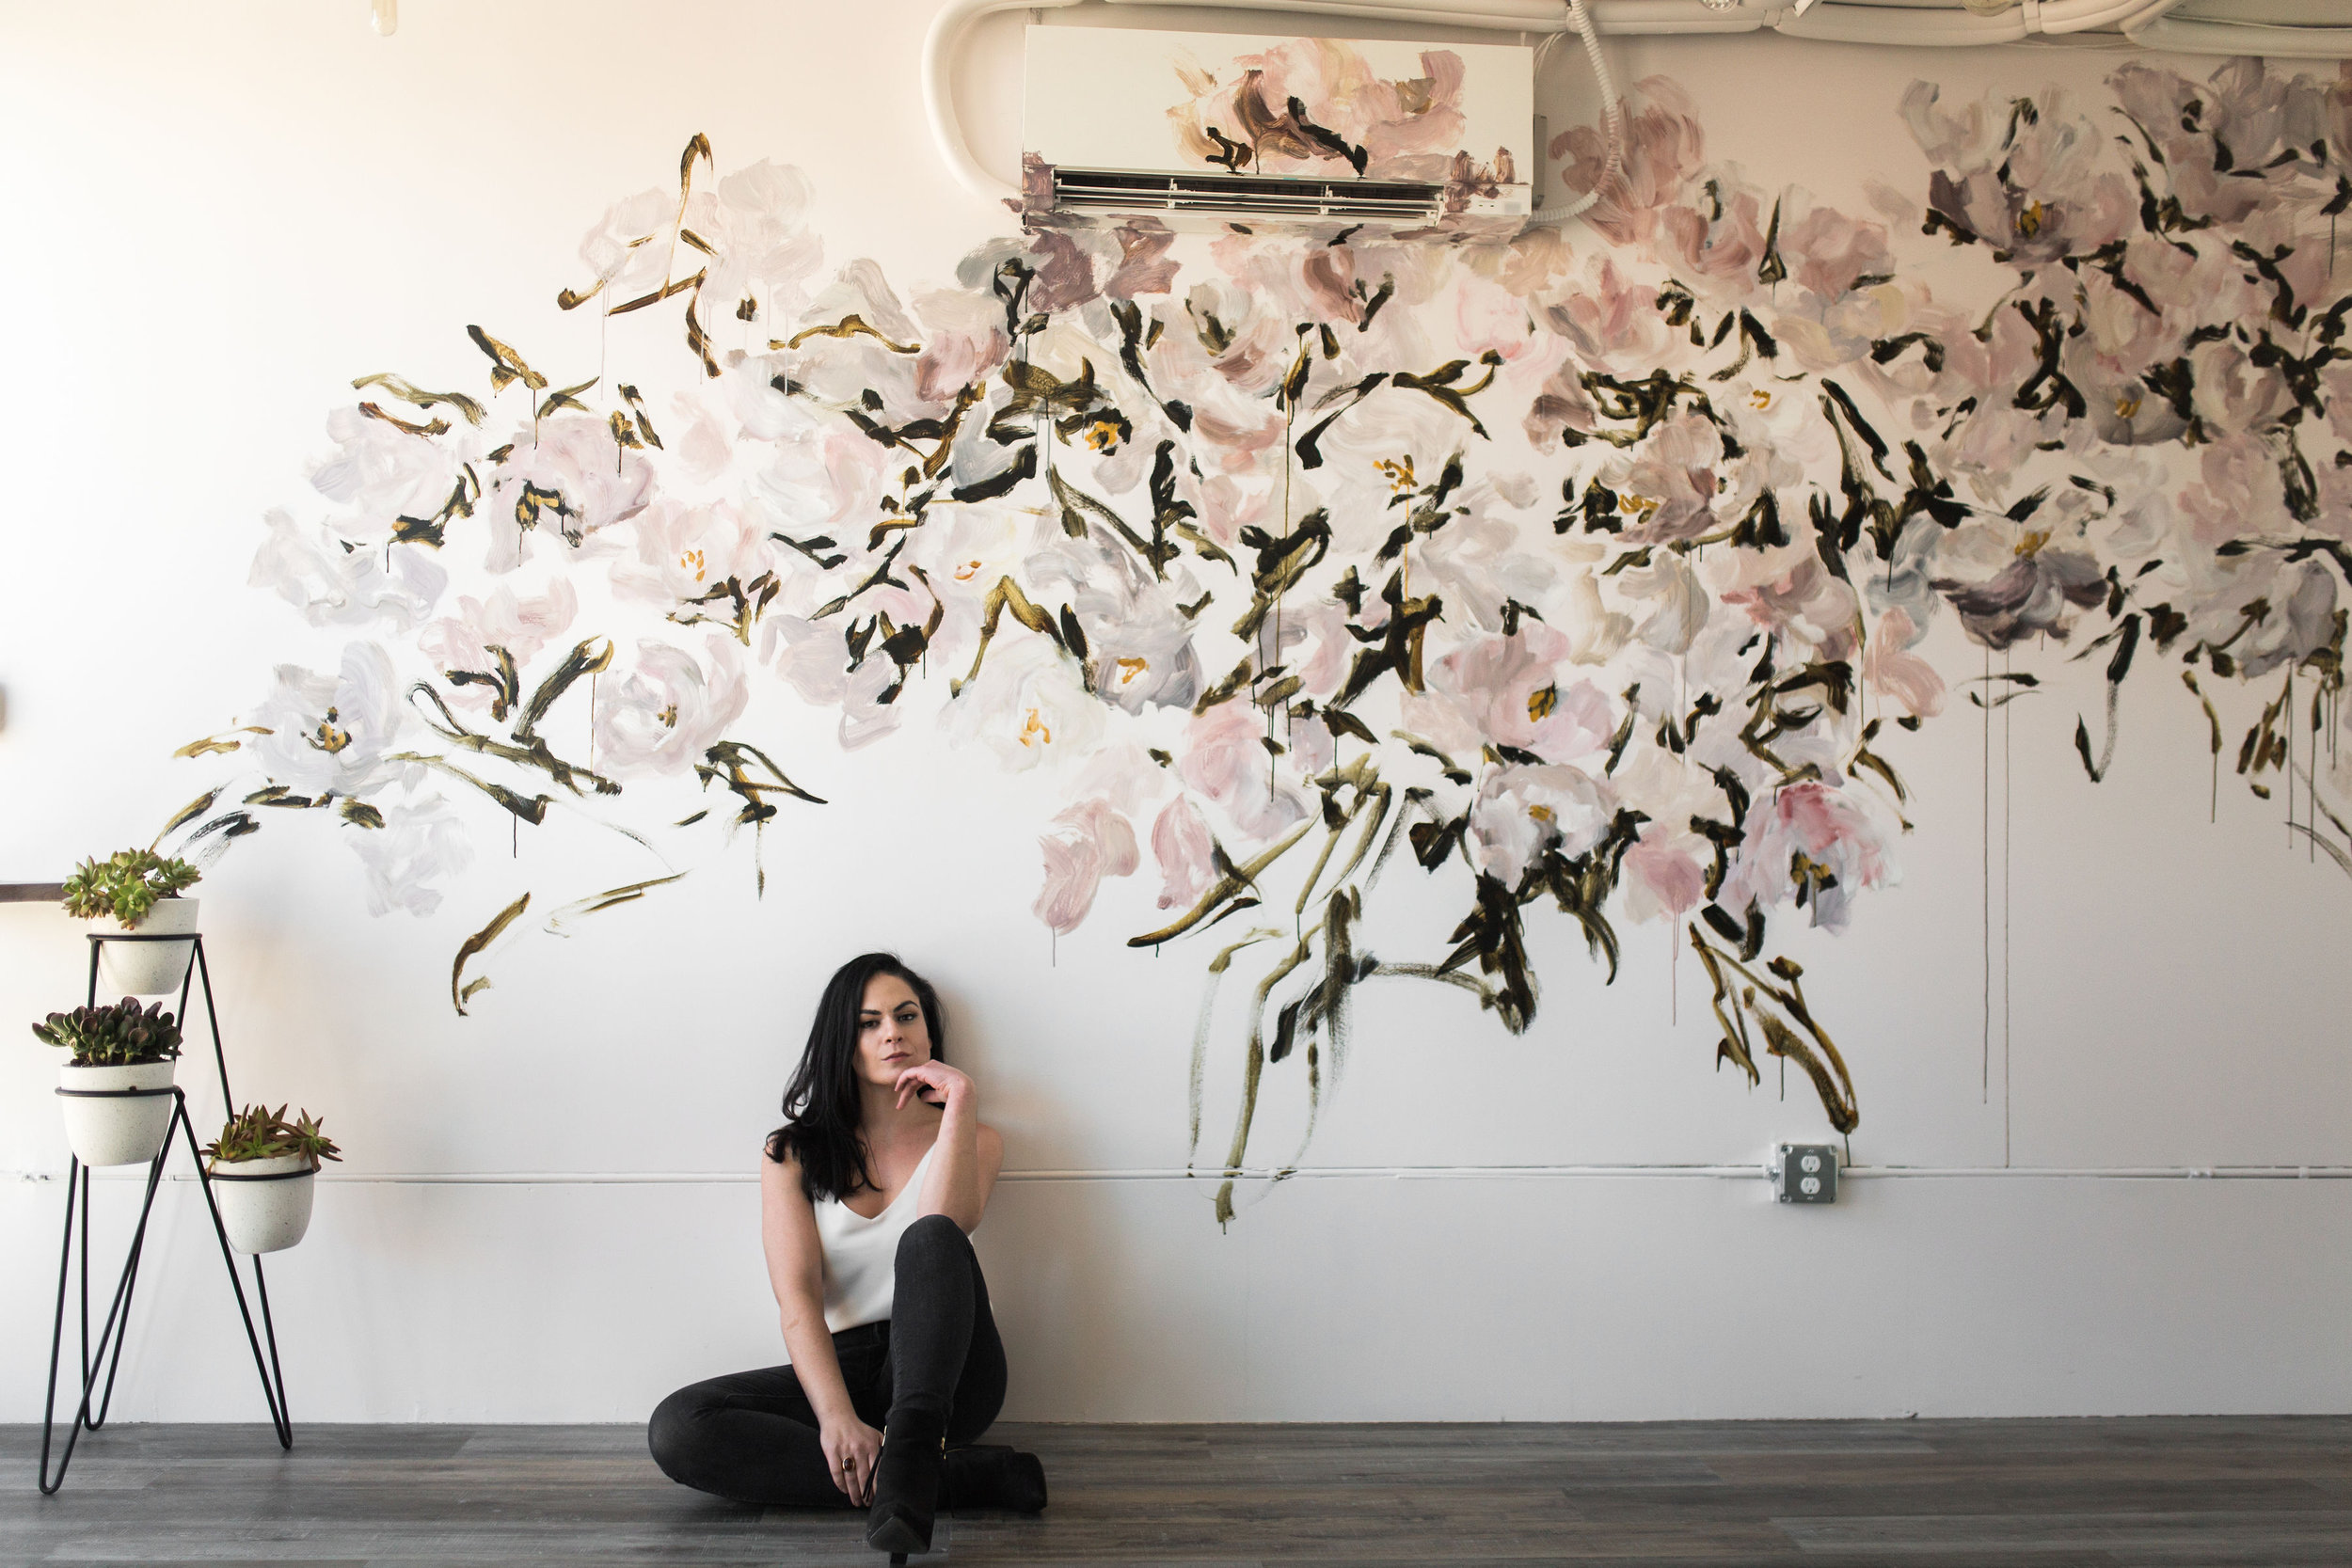 AshleyJoon_Artist_Denver_2019 - Ashley Joon.jpg